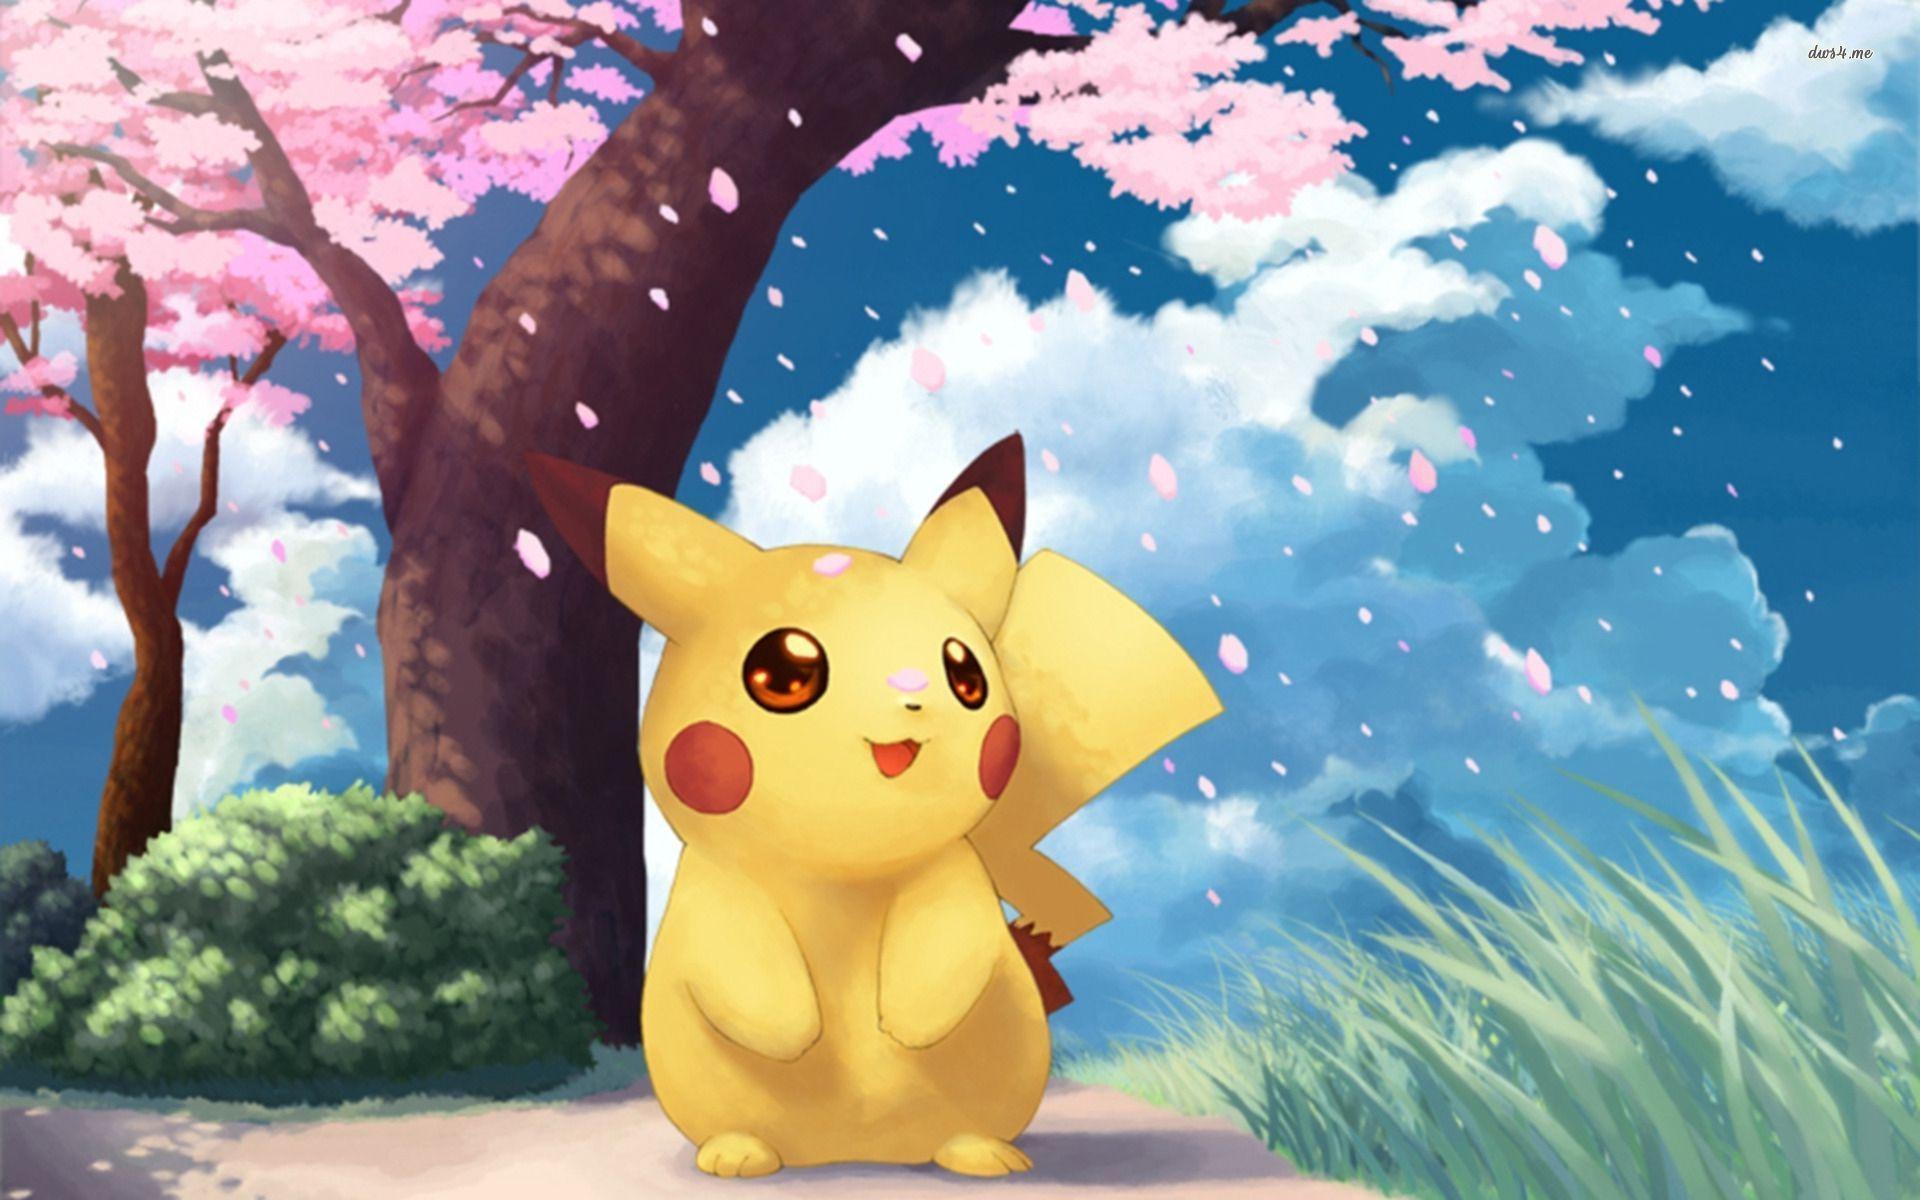 Pokemon Pikachu Wallpapers Top Free Pokemon Pikachu Backgrounds Wallpaperaccess